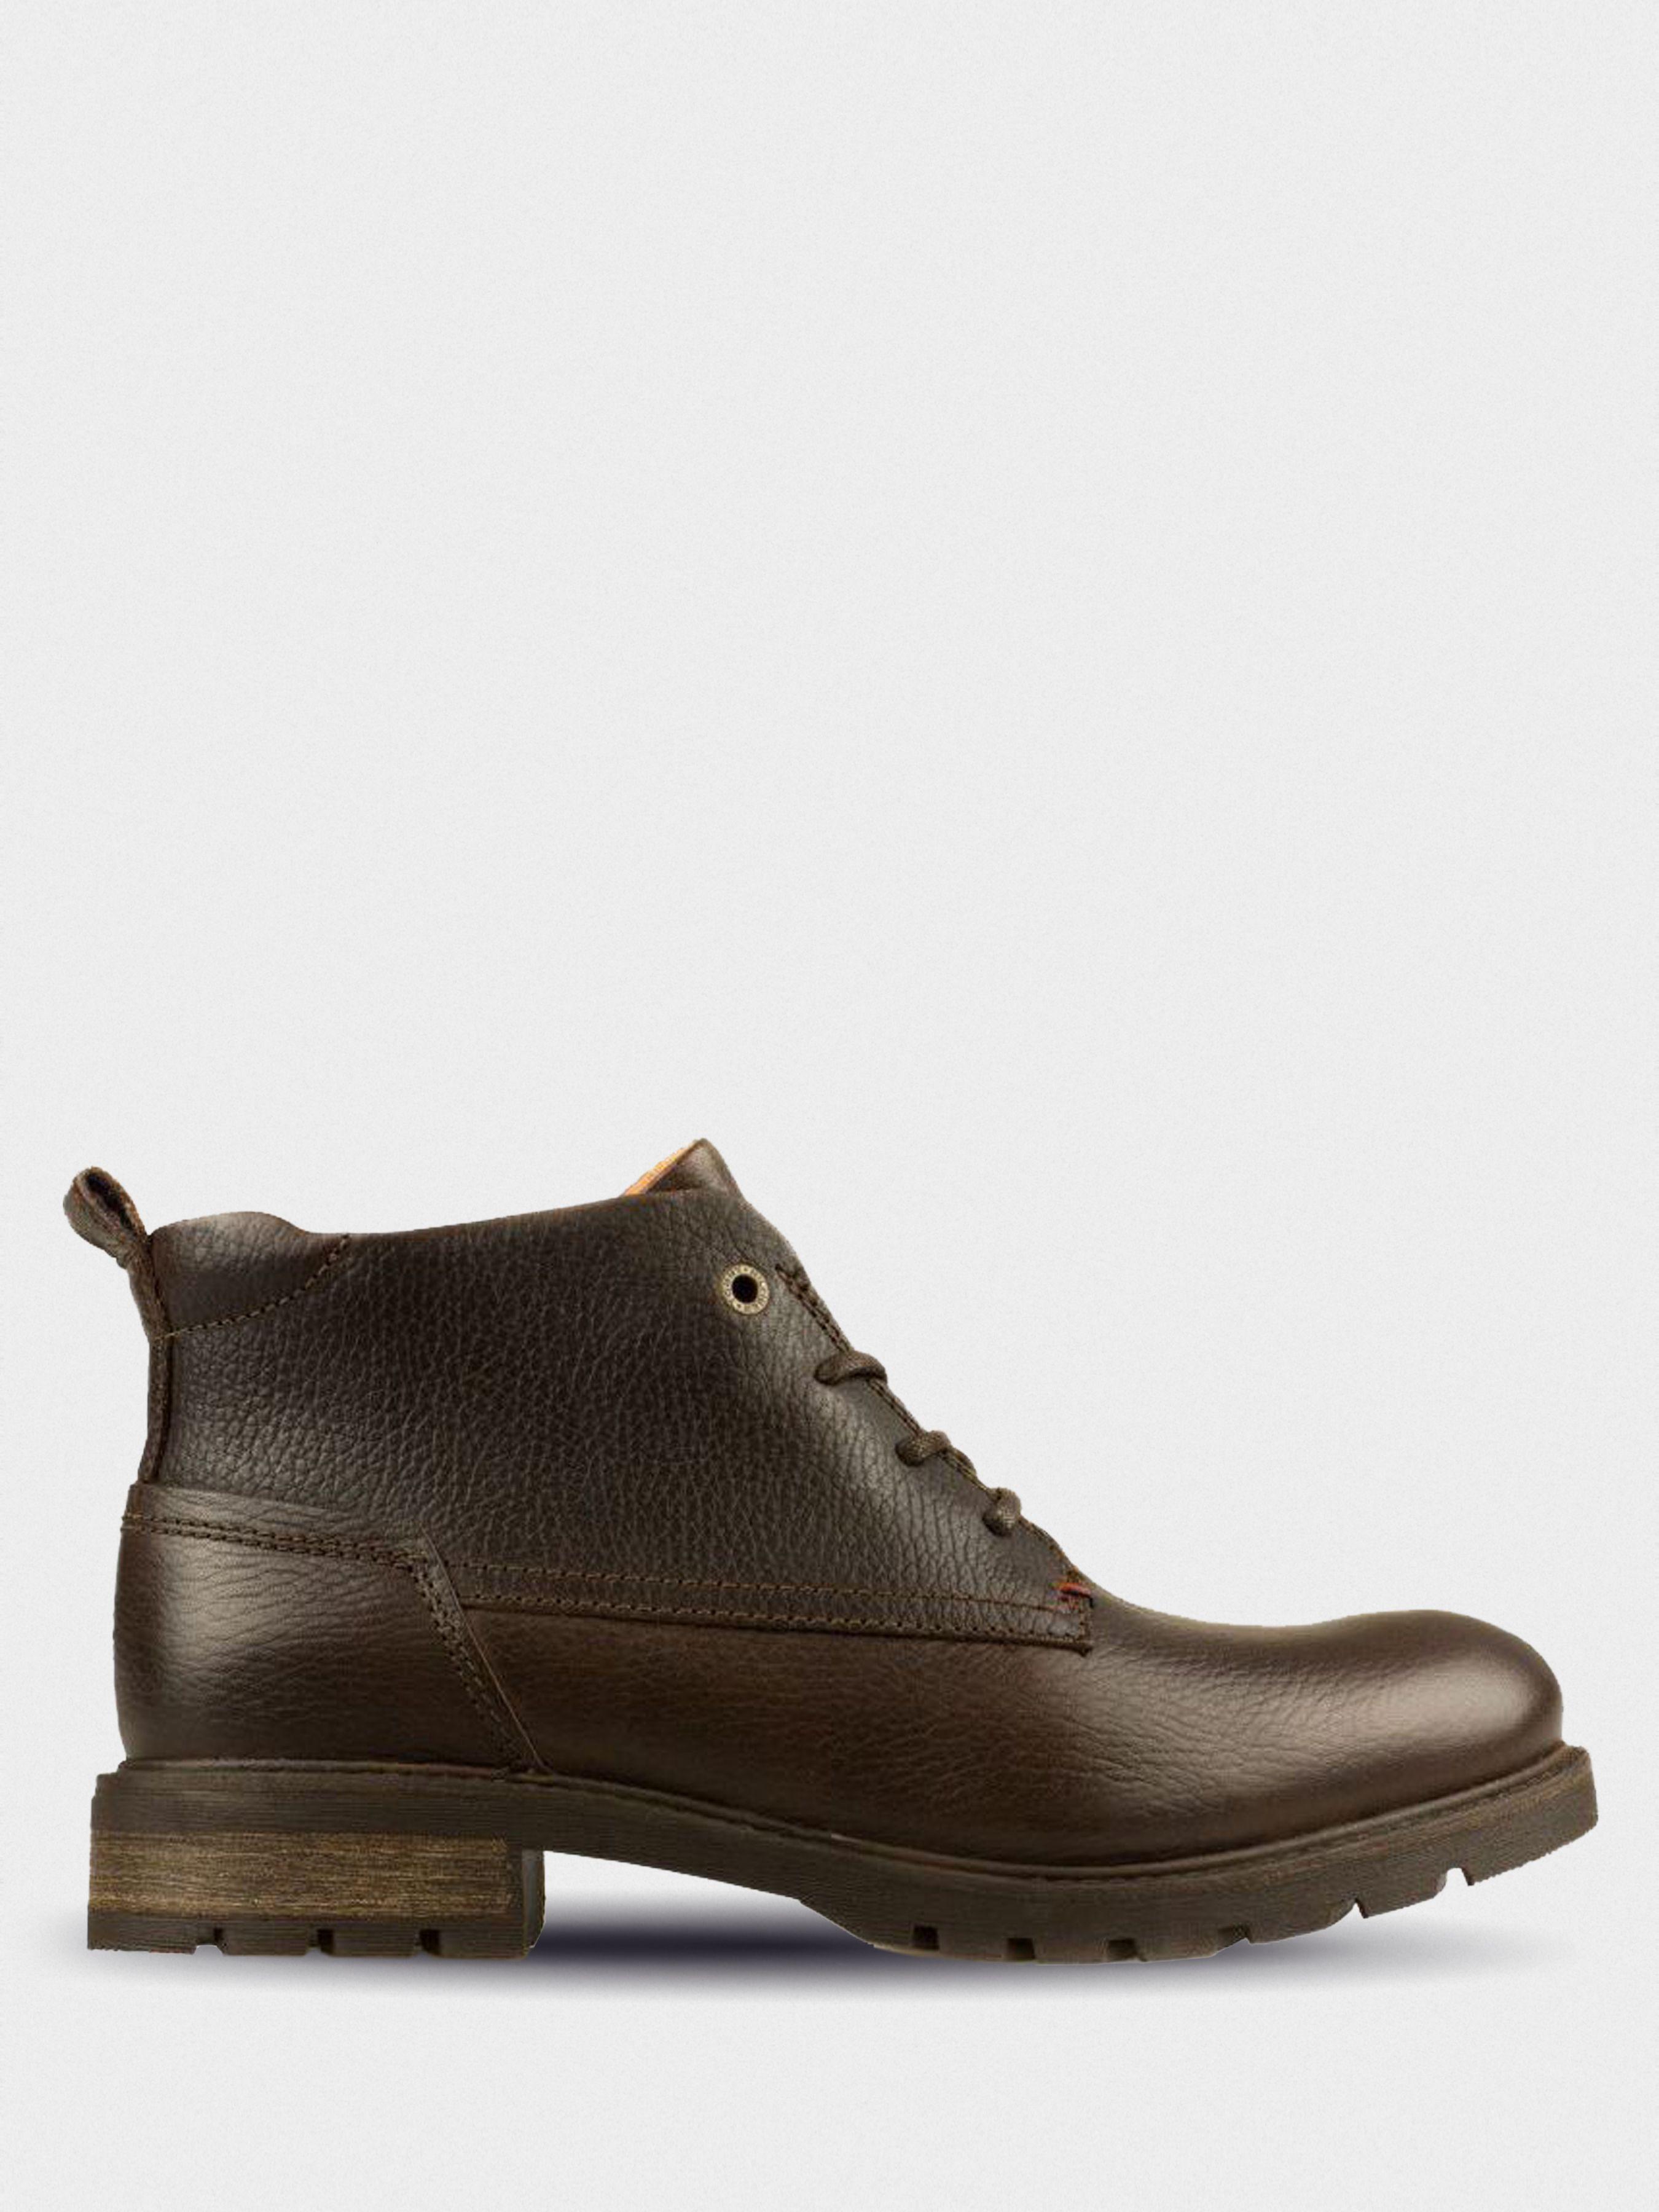 Ботинки для мужчин Tommy Hilfiger TE686 брендовая обувь, 2017